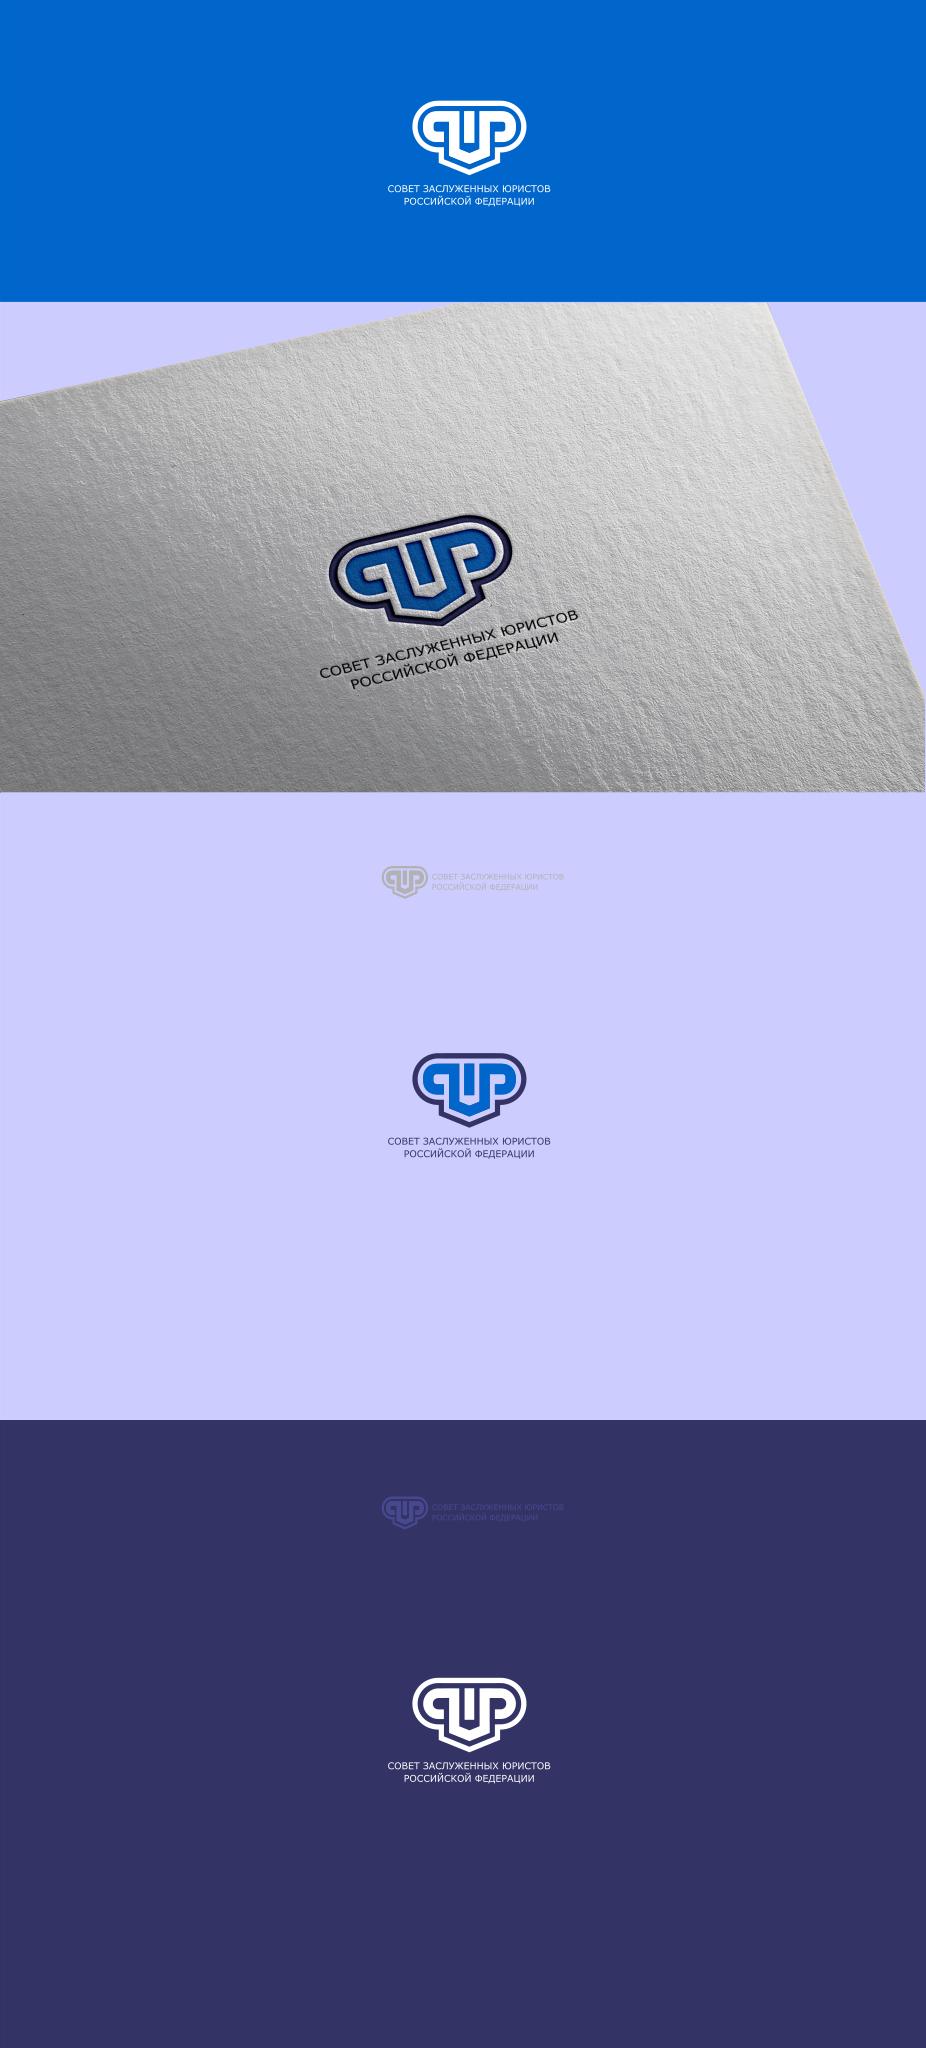 Разработка логотипа Совета (Клуба) заслуженных юристов Российской Федерации фото f_6525e40463adda7e.png